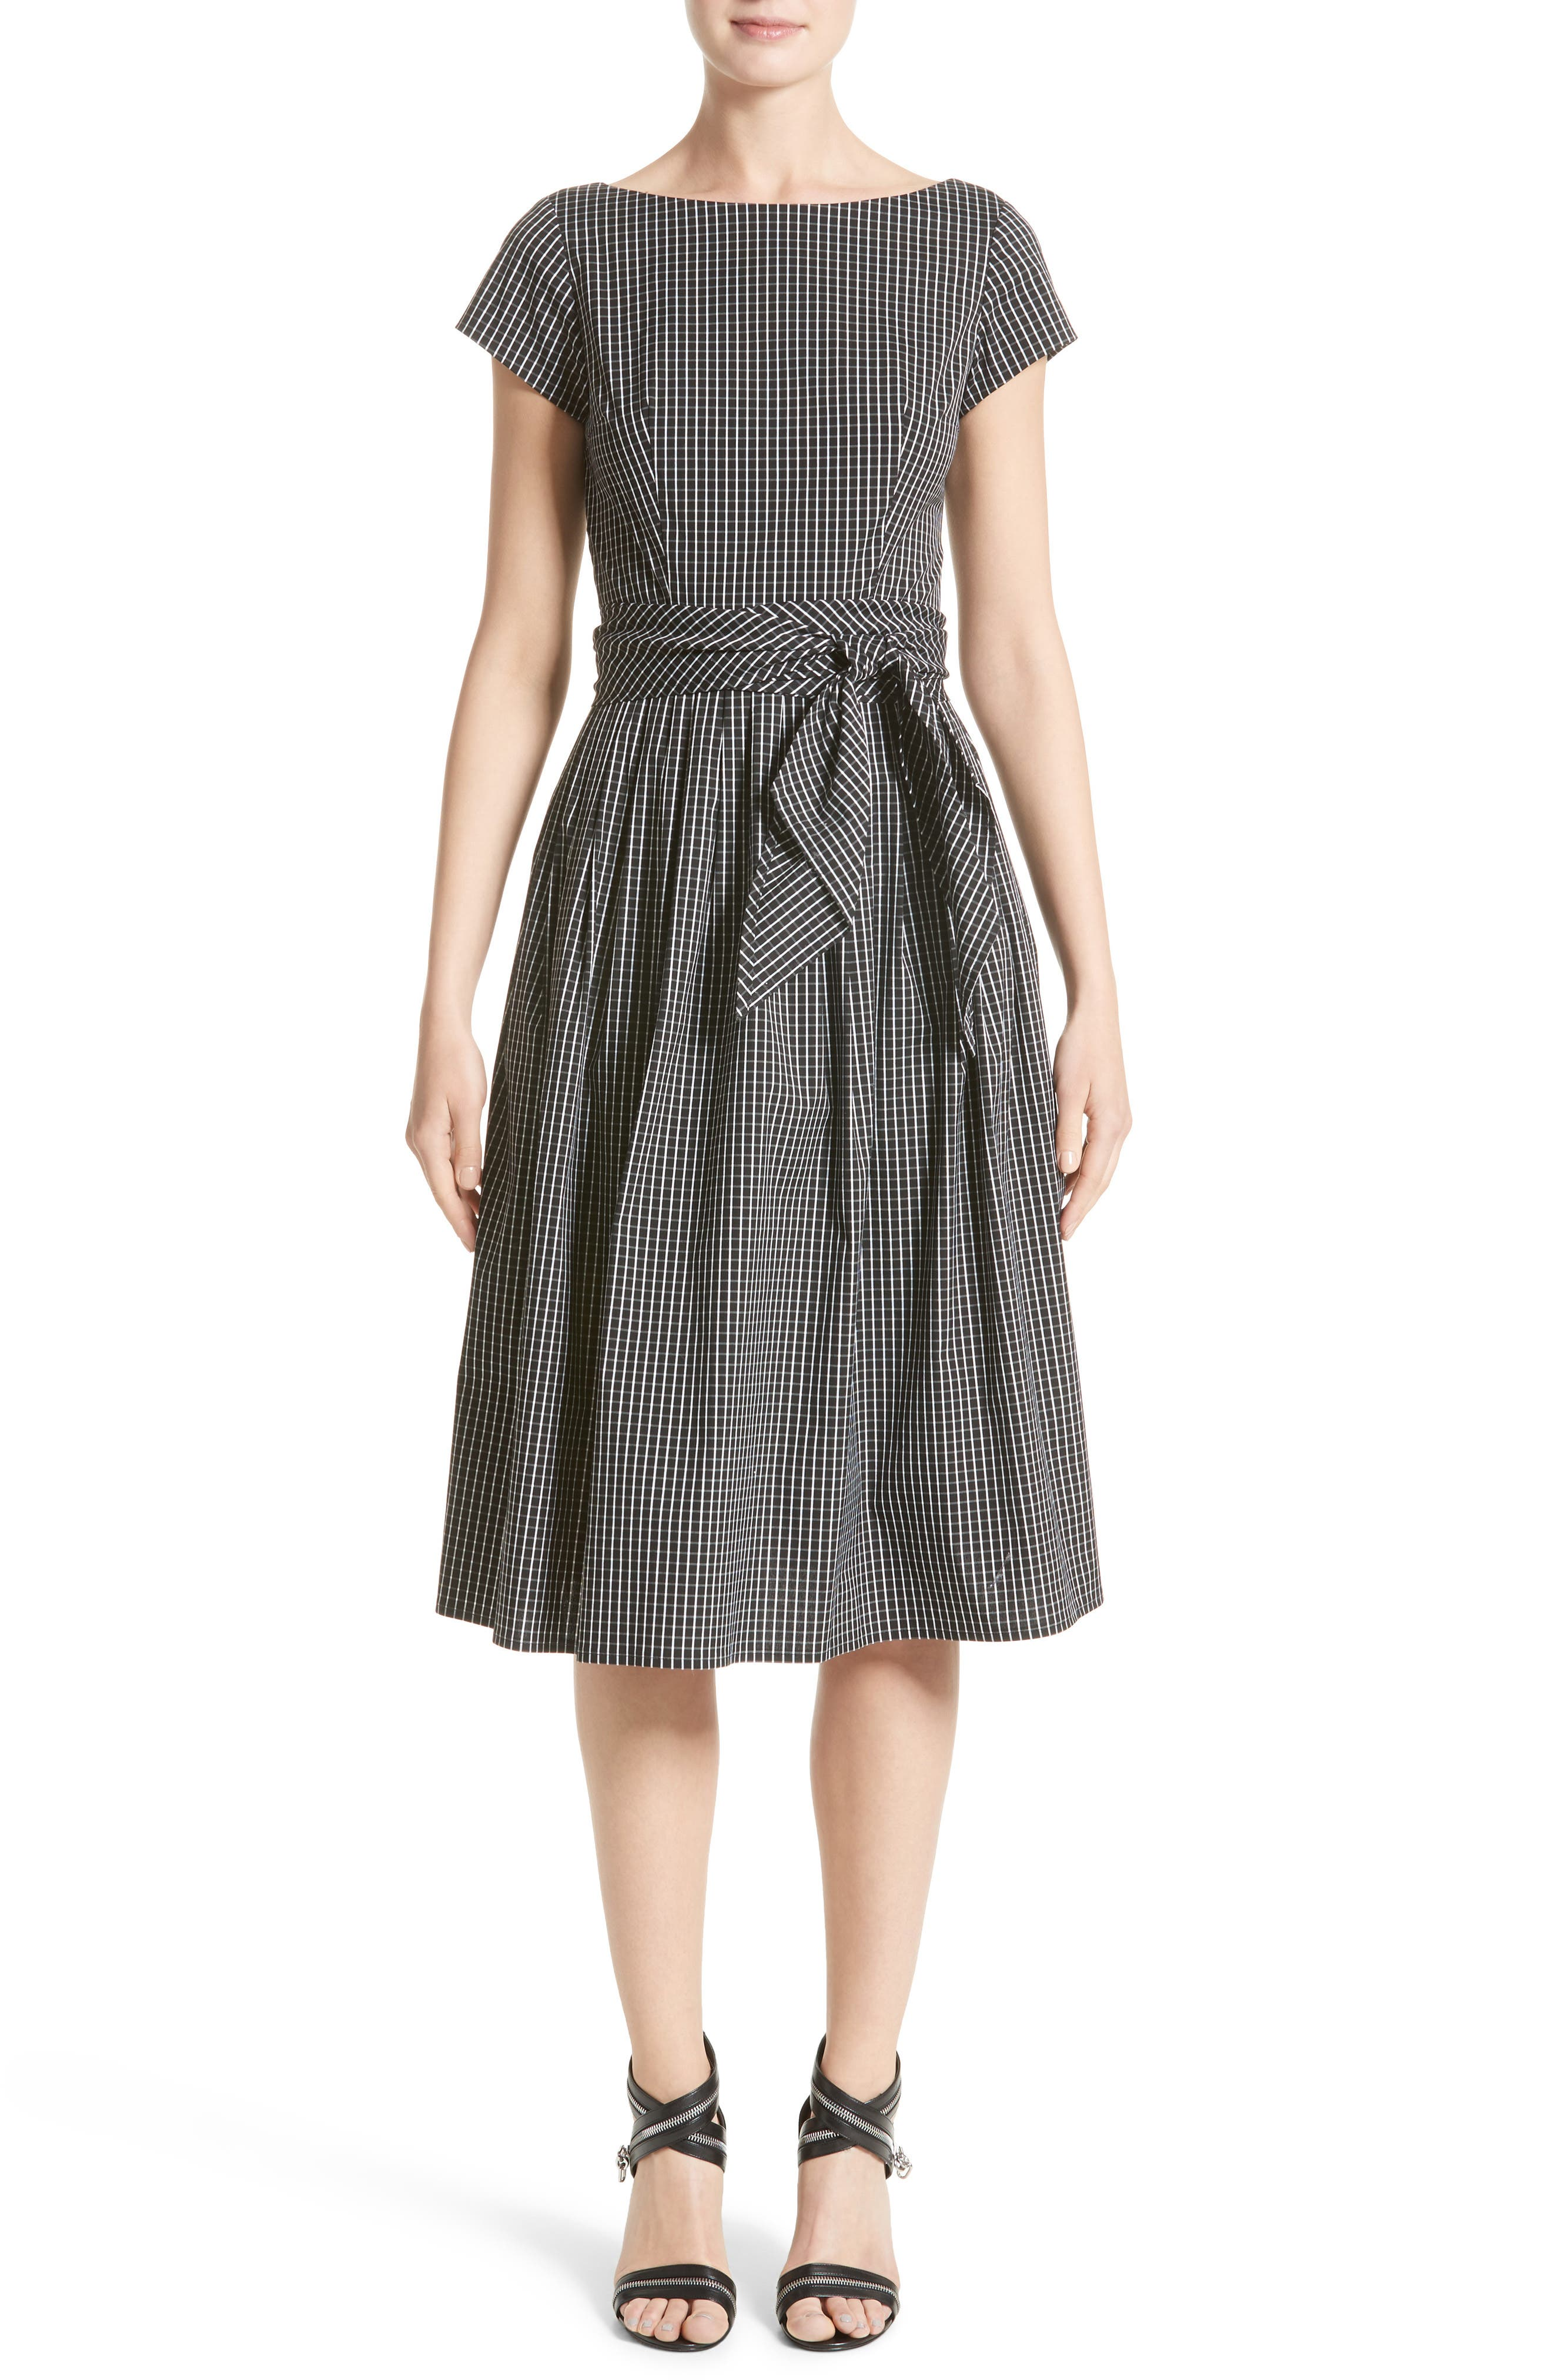 Windowpane Stretch Cotton Poplin Dress,                             Main thumbnail 1, color,                             003